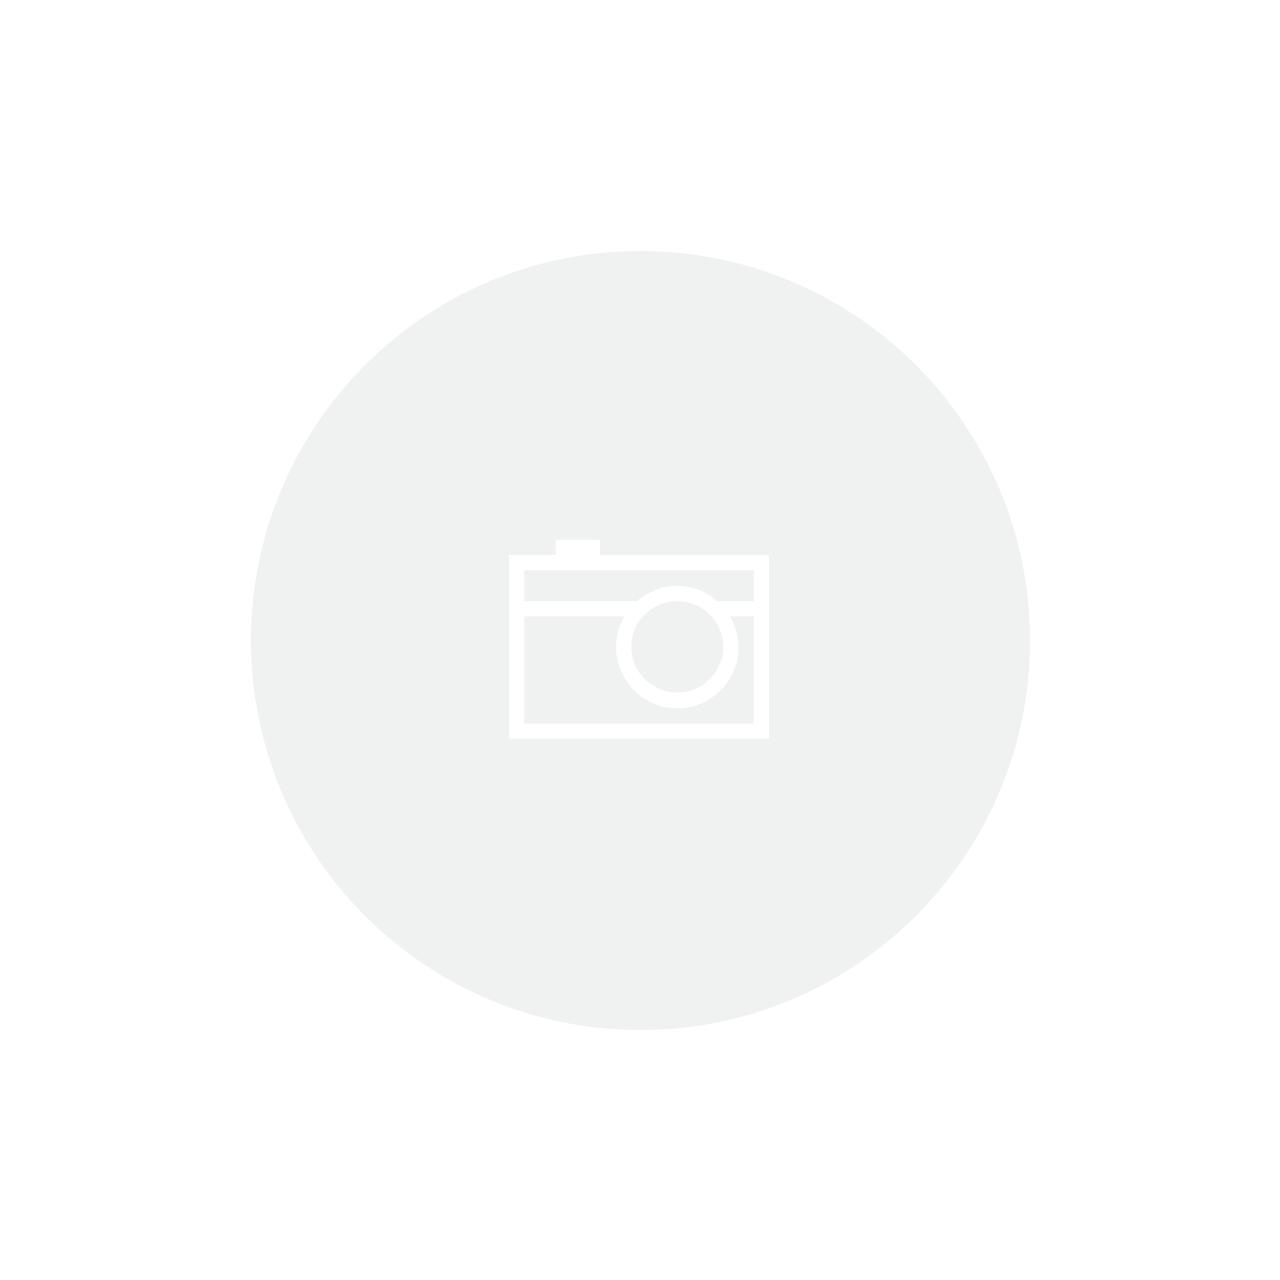 Cesto Oval Arame c/ Forro 24x15x10cm Martiplast